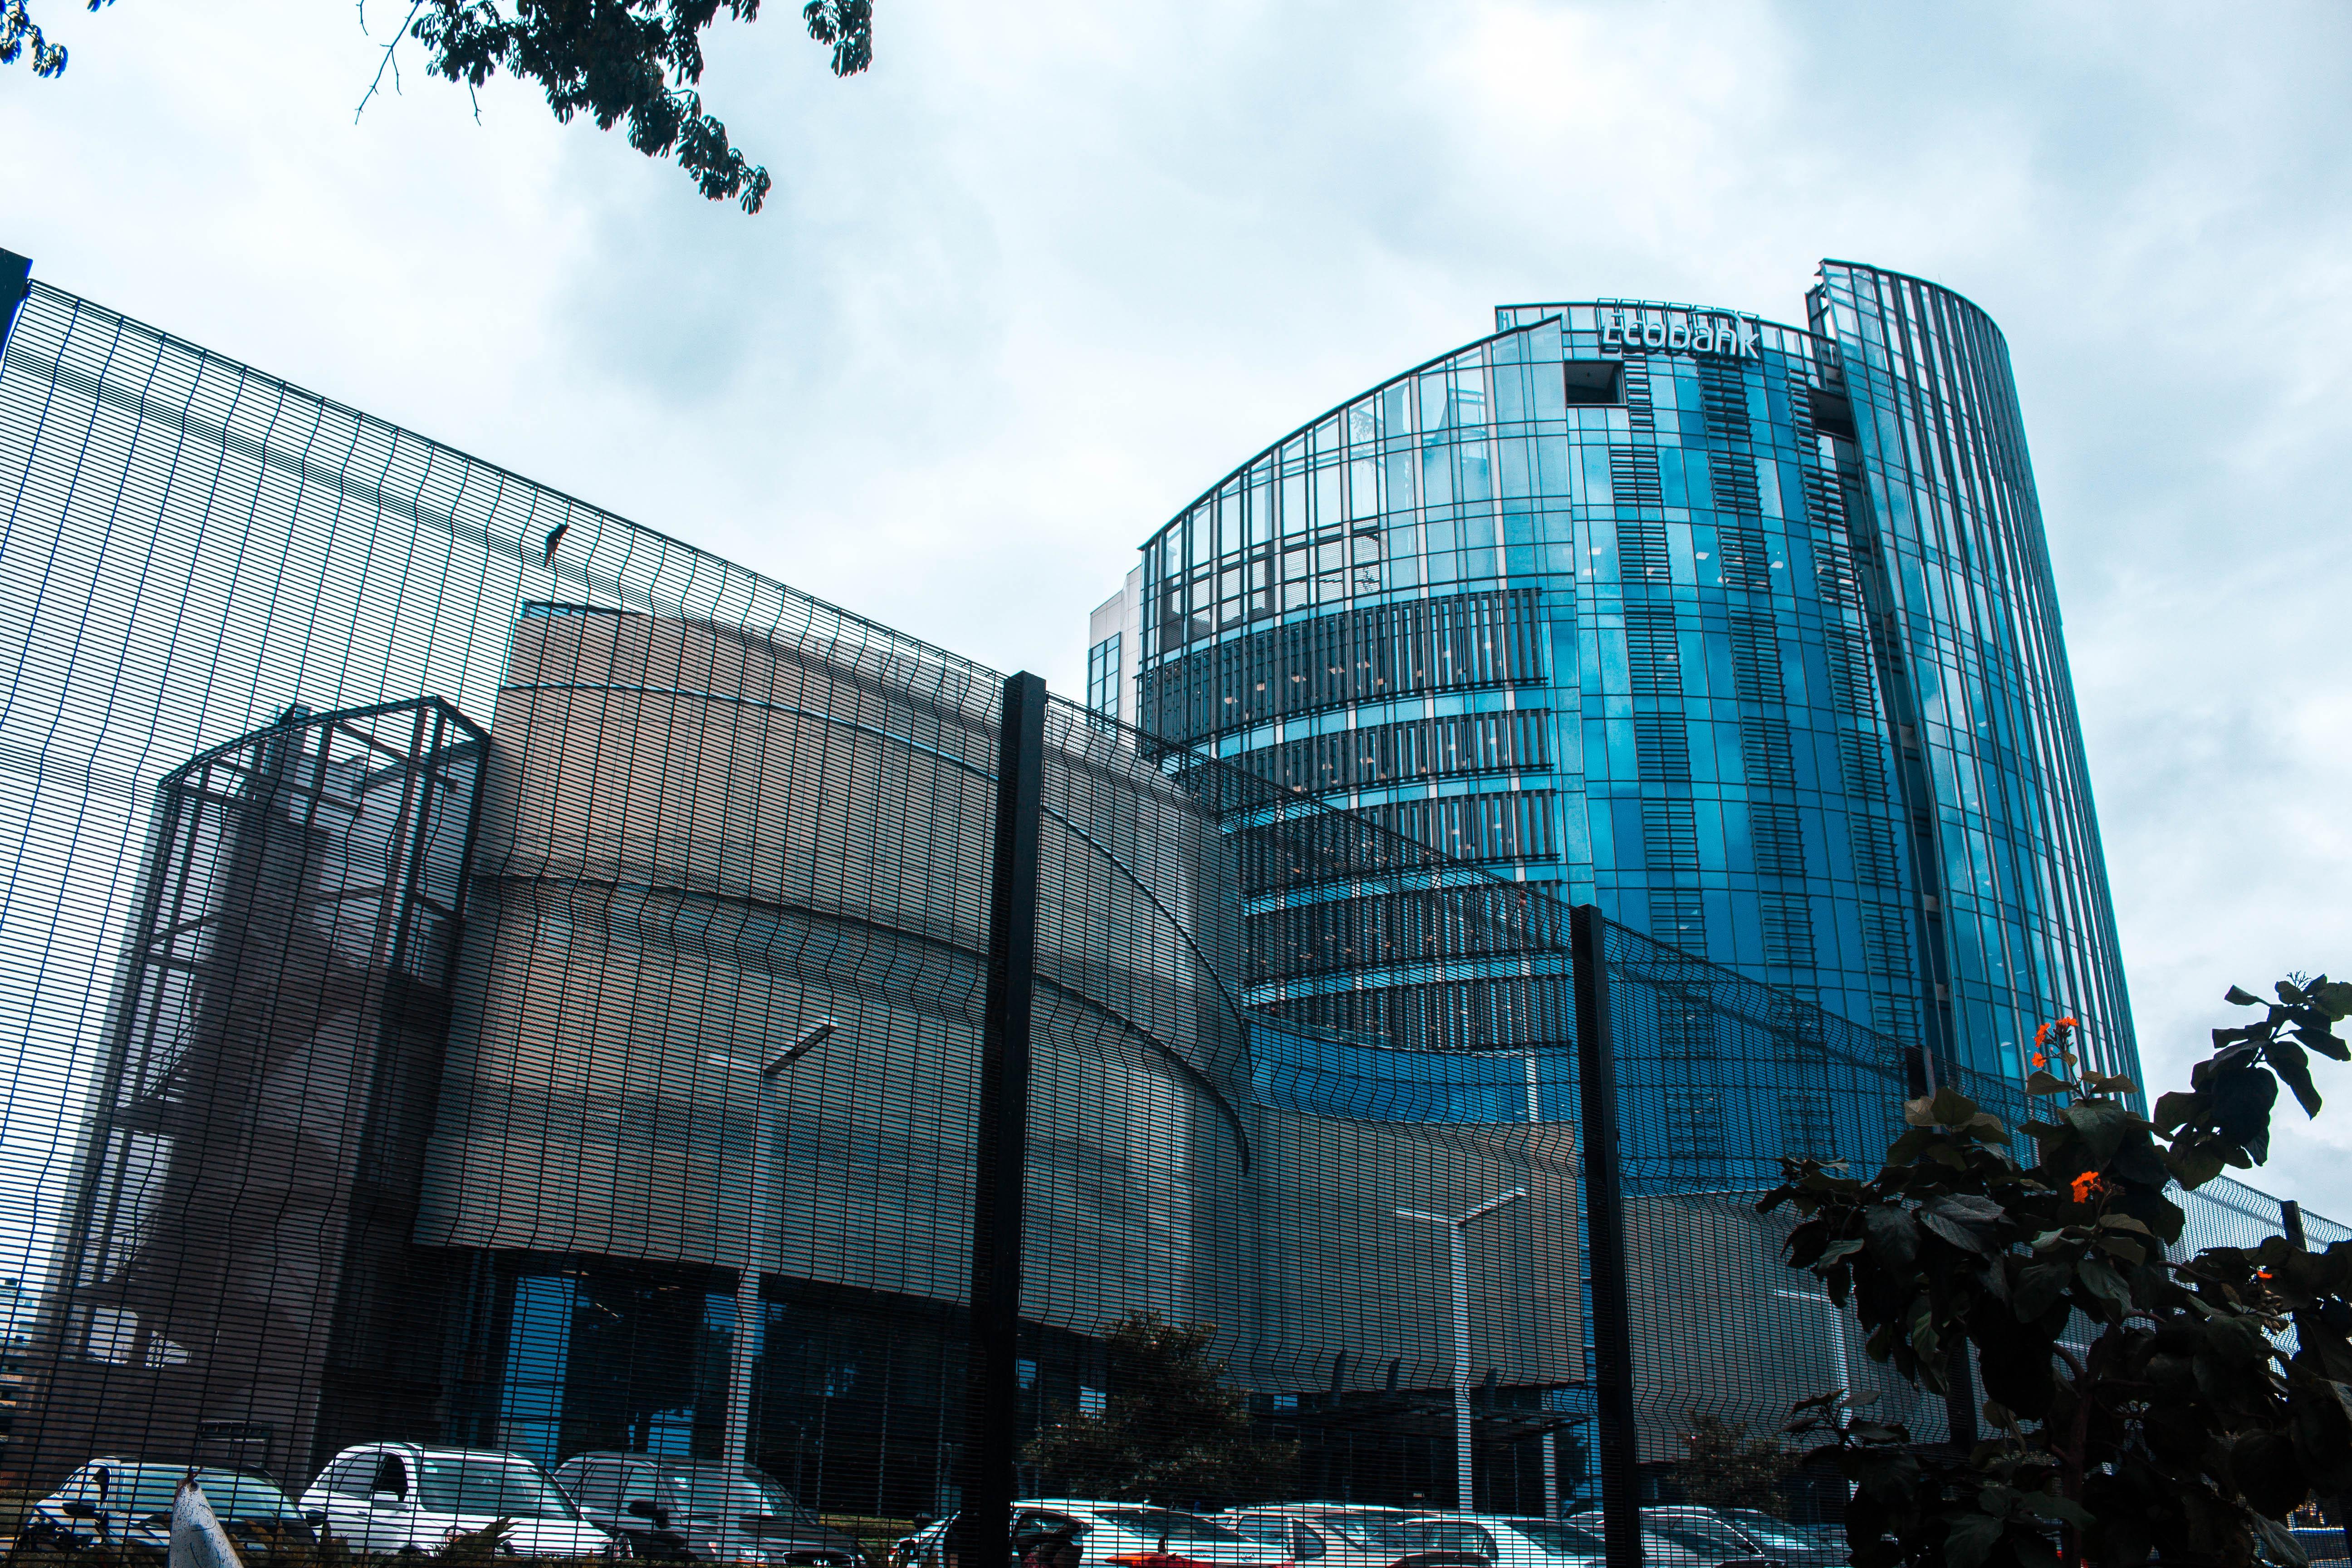 stalking bancario approfondimento avvocatoflash